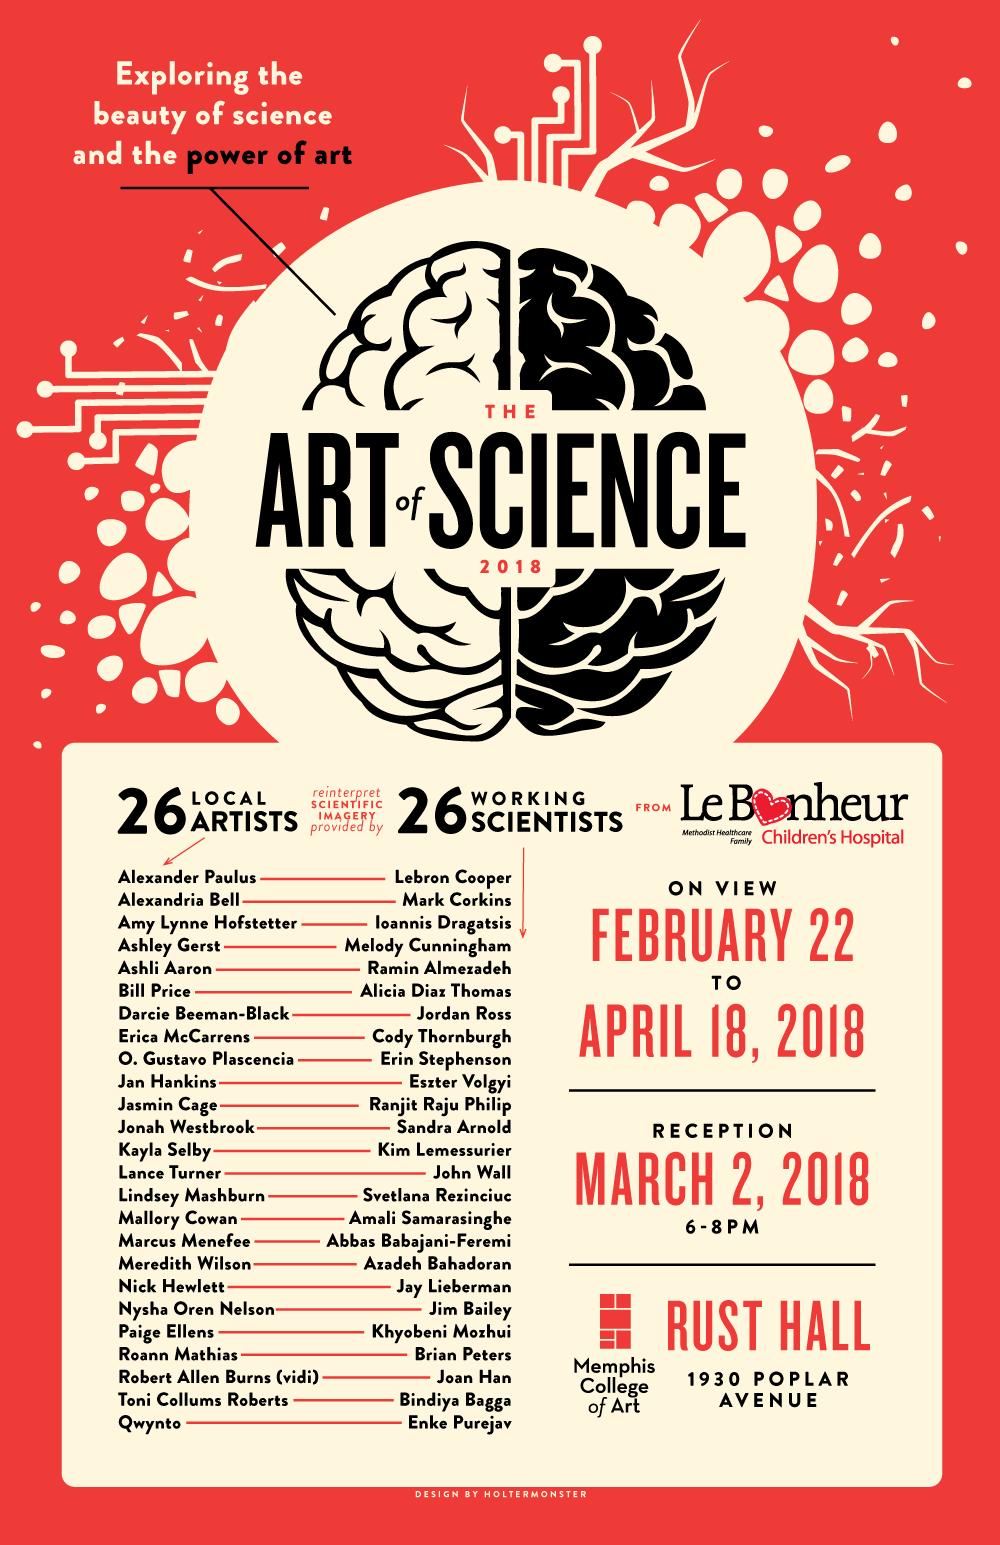 Art of Science 2018